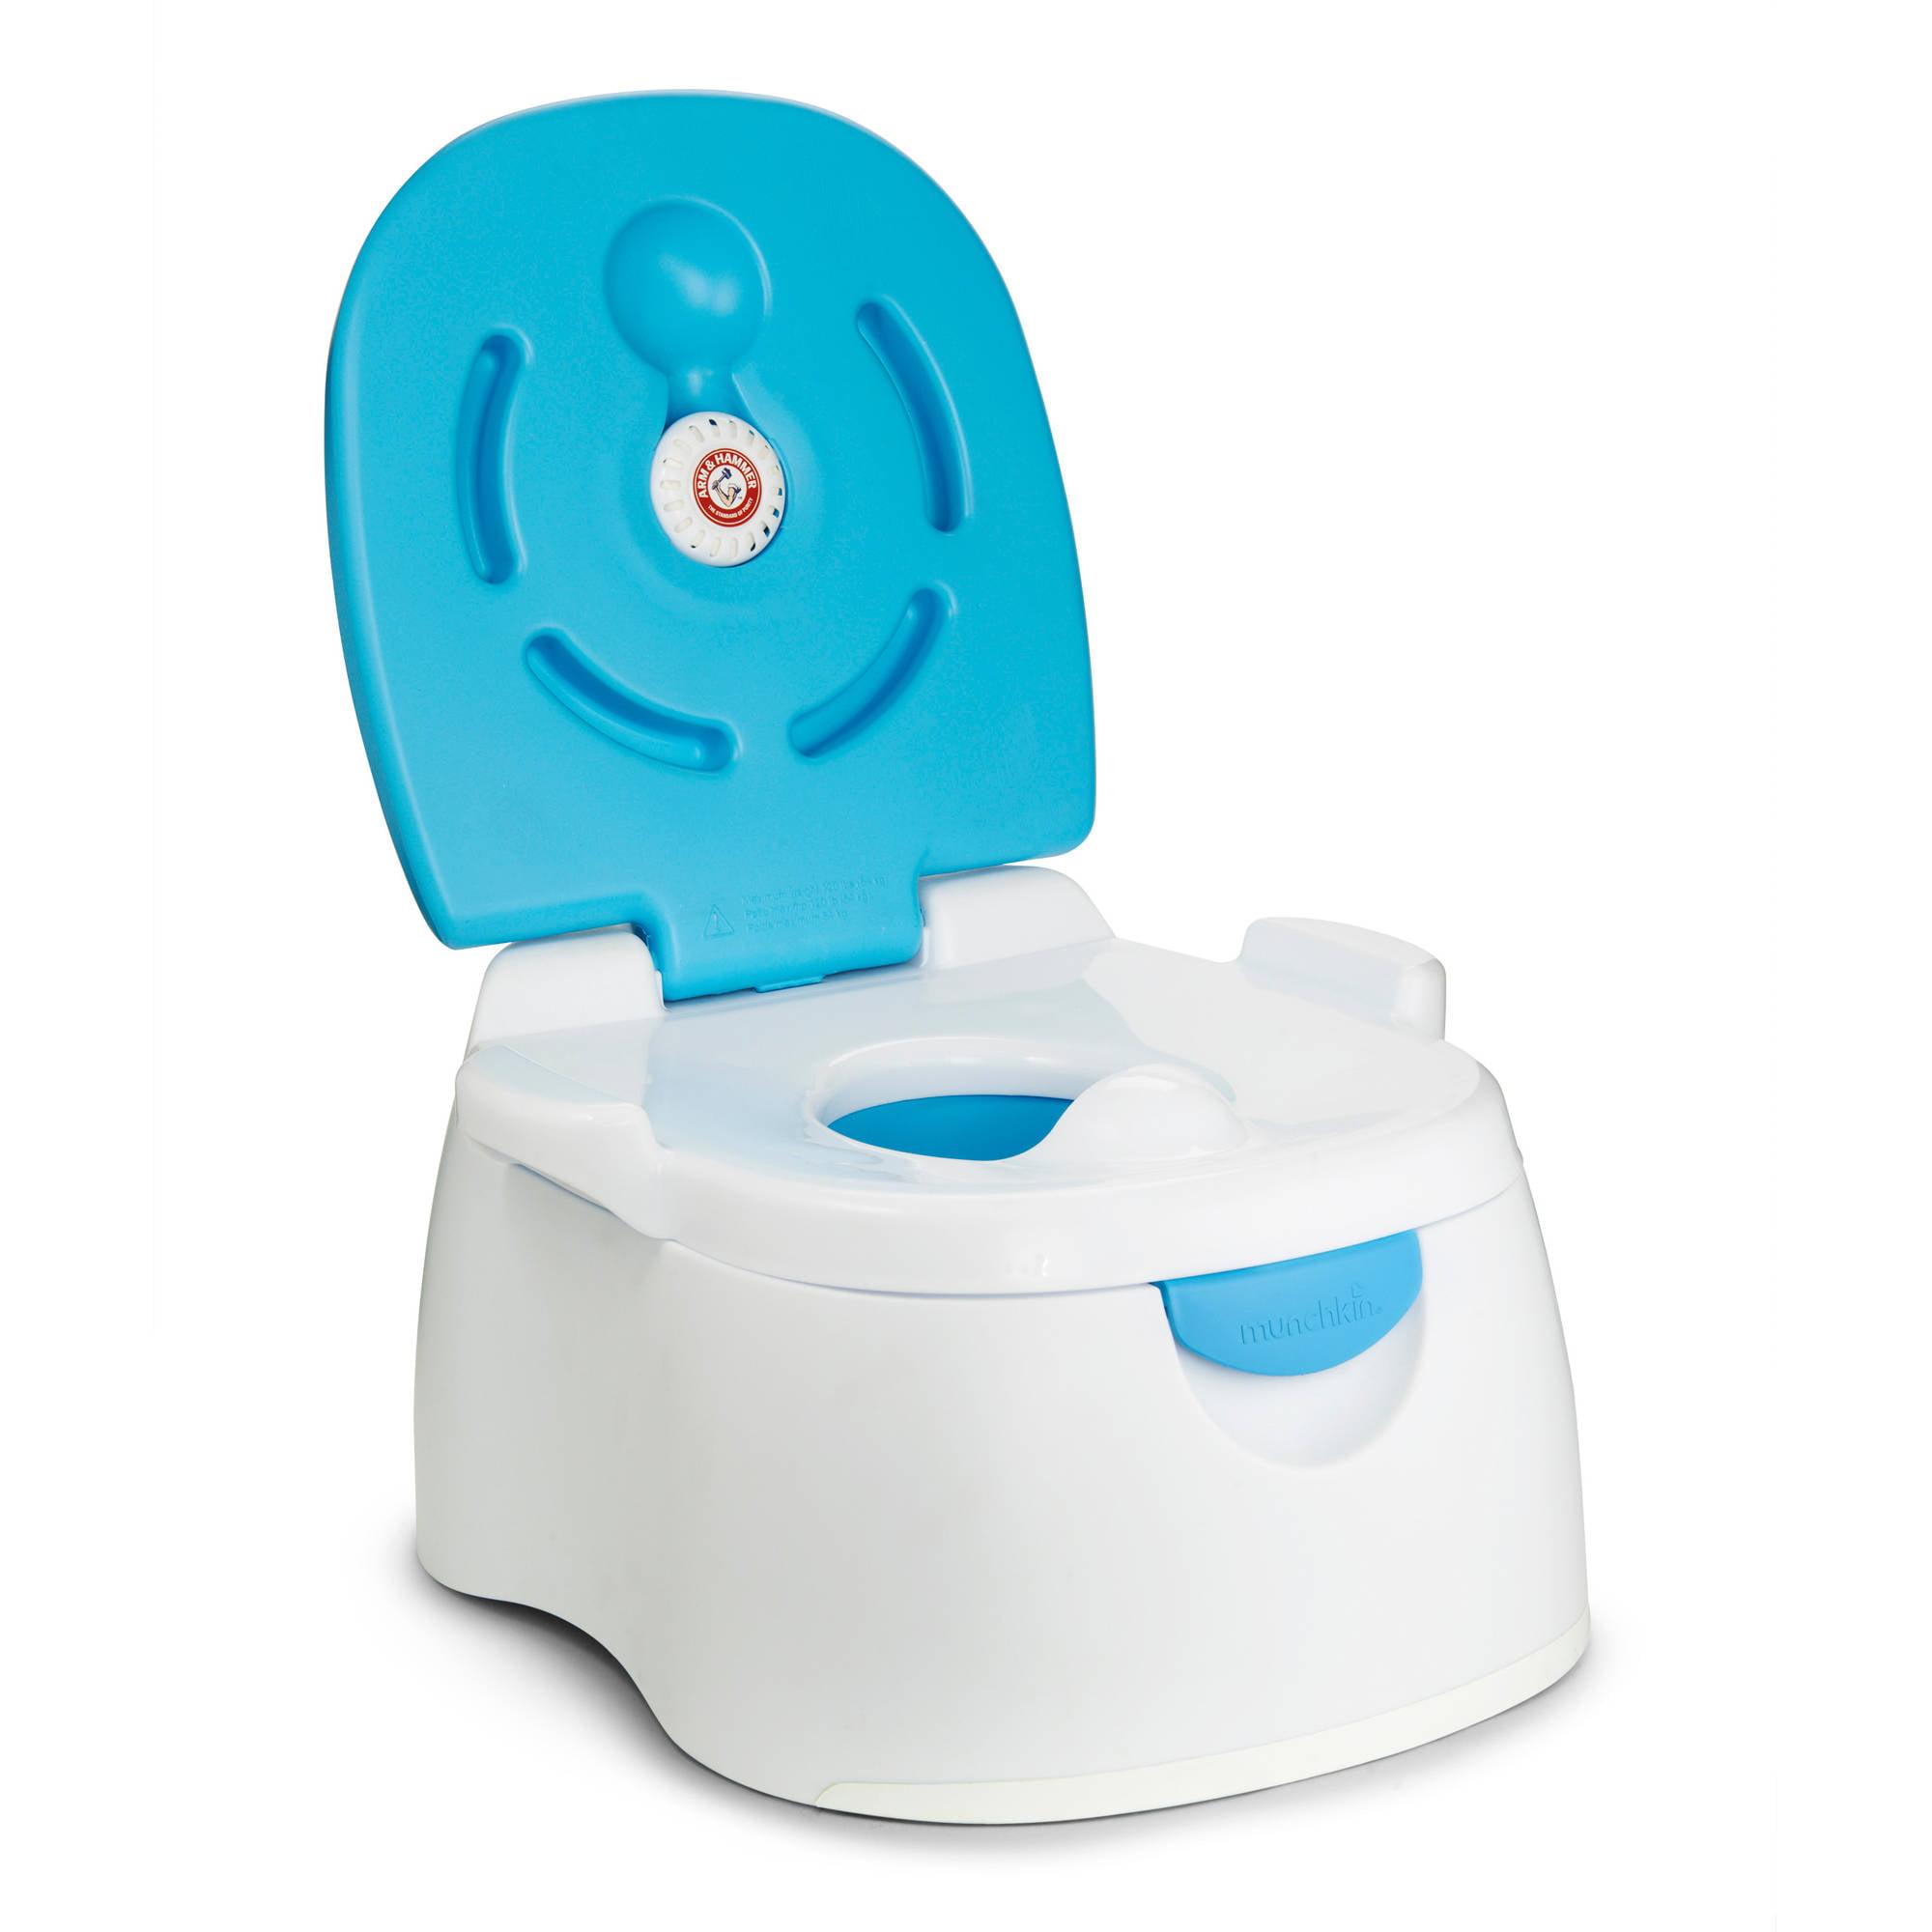 Baby bath chair walmart - Baby Bath Chair Walmart 38